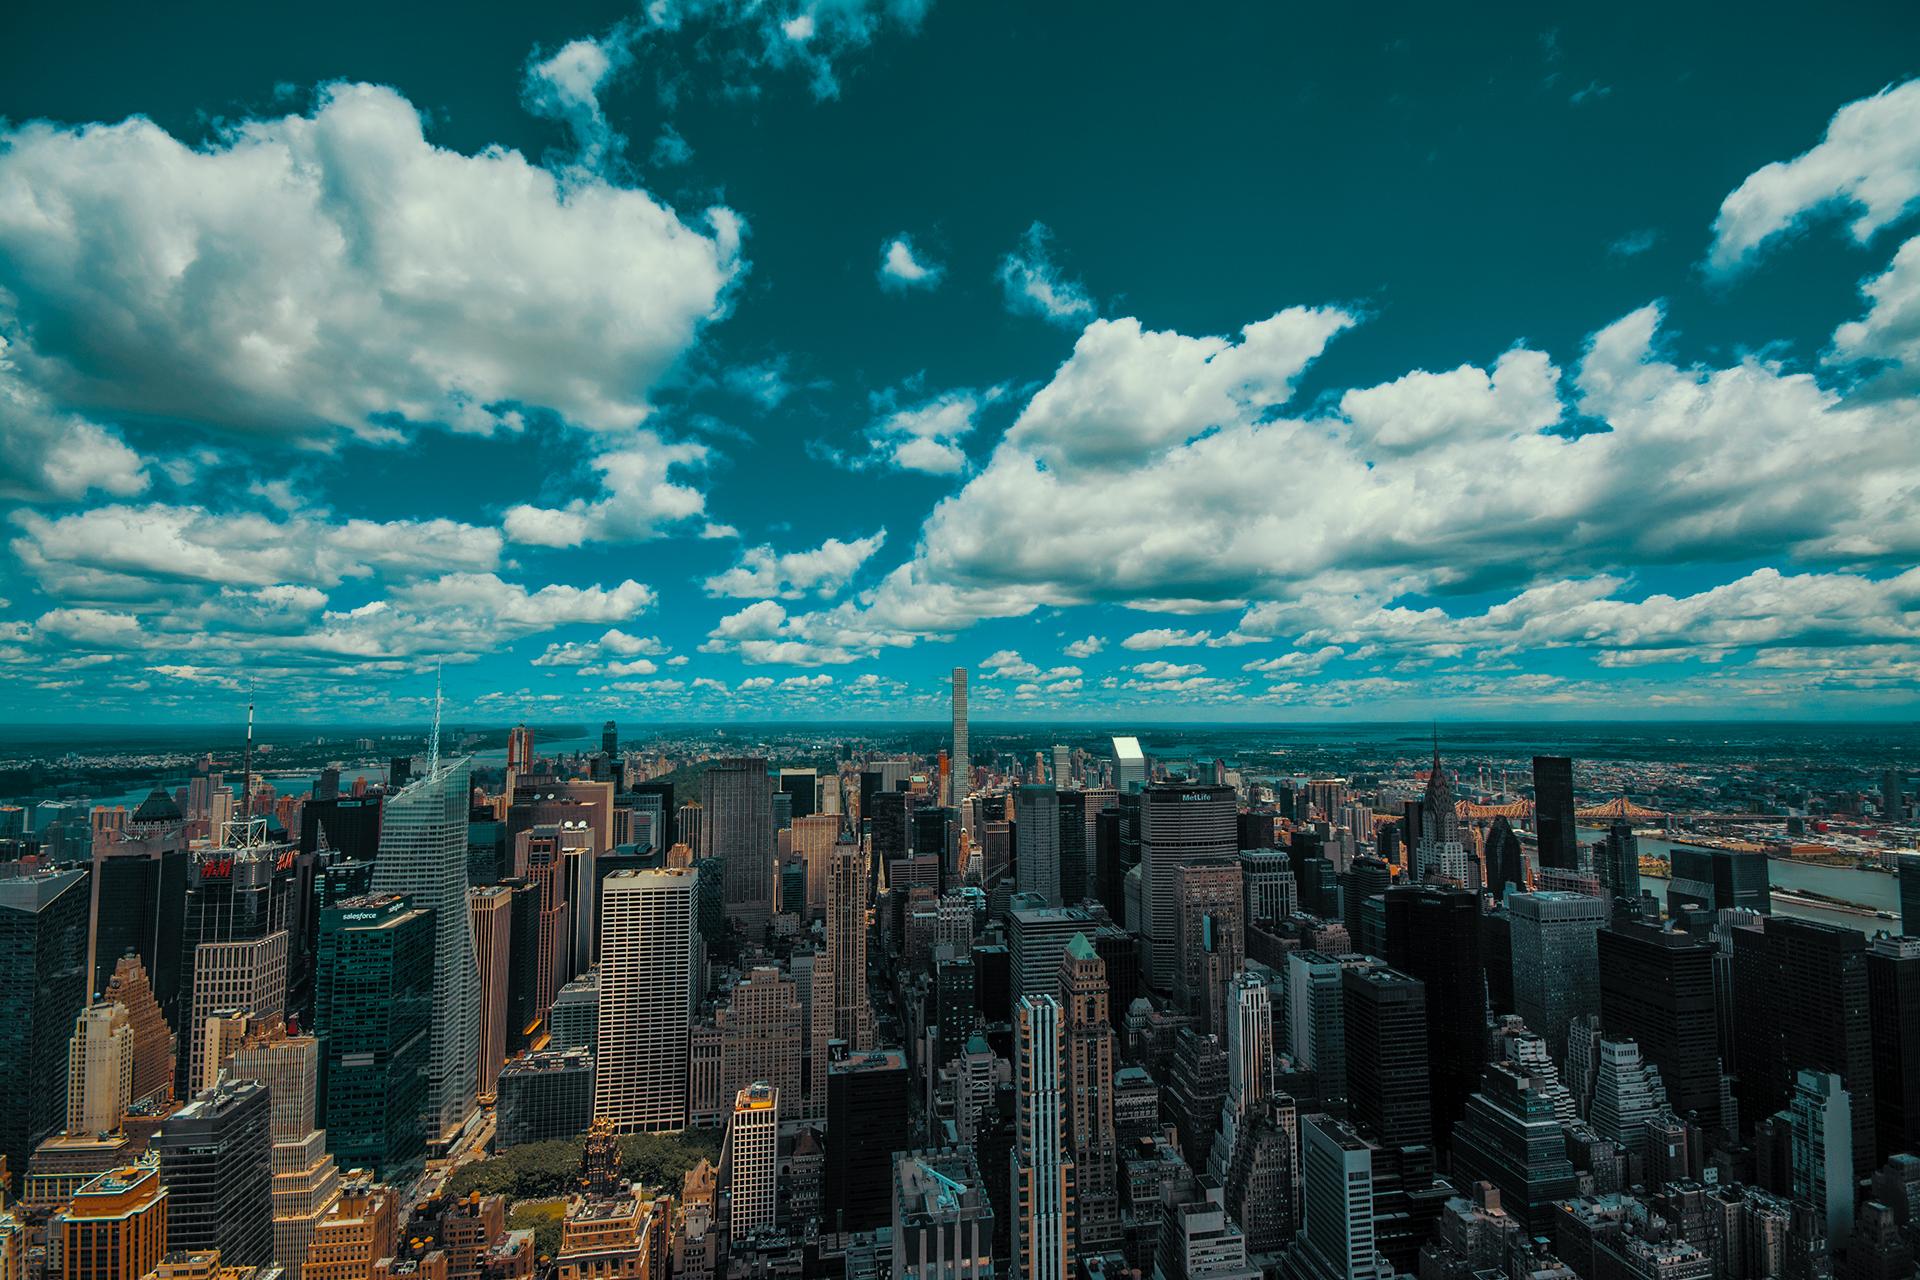 General 1920x1280 New York City Empire State Building USA horizon blue sky skyscraper Hudson River clouds